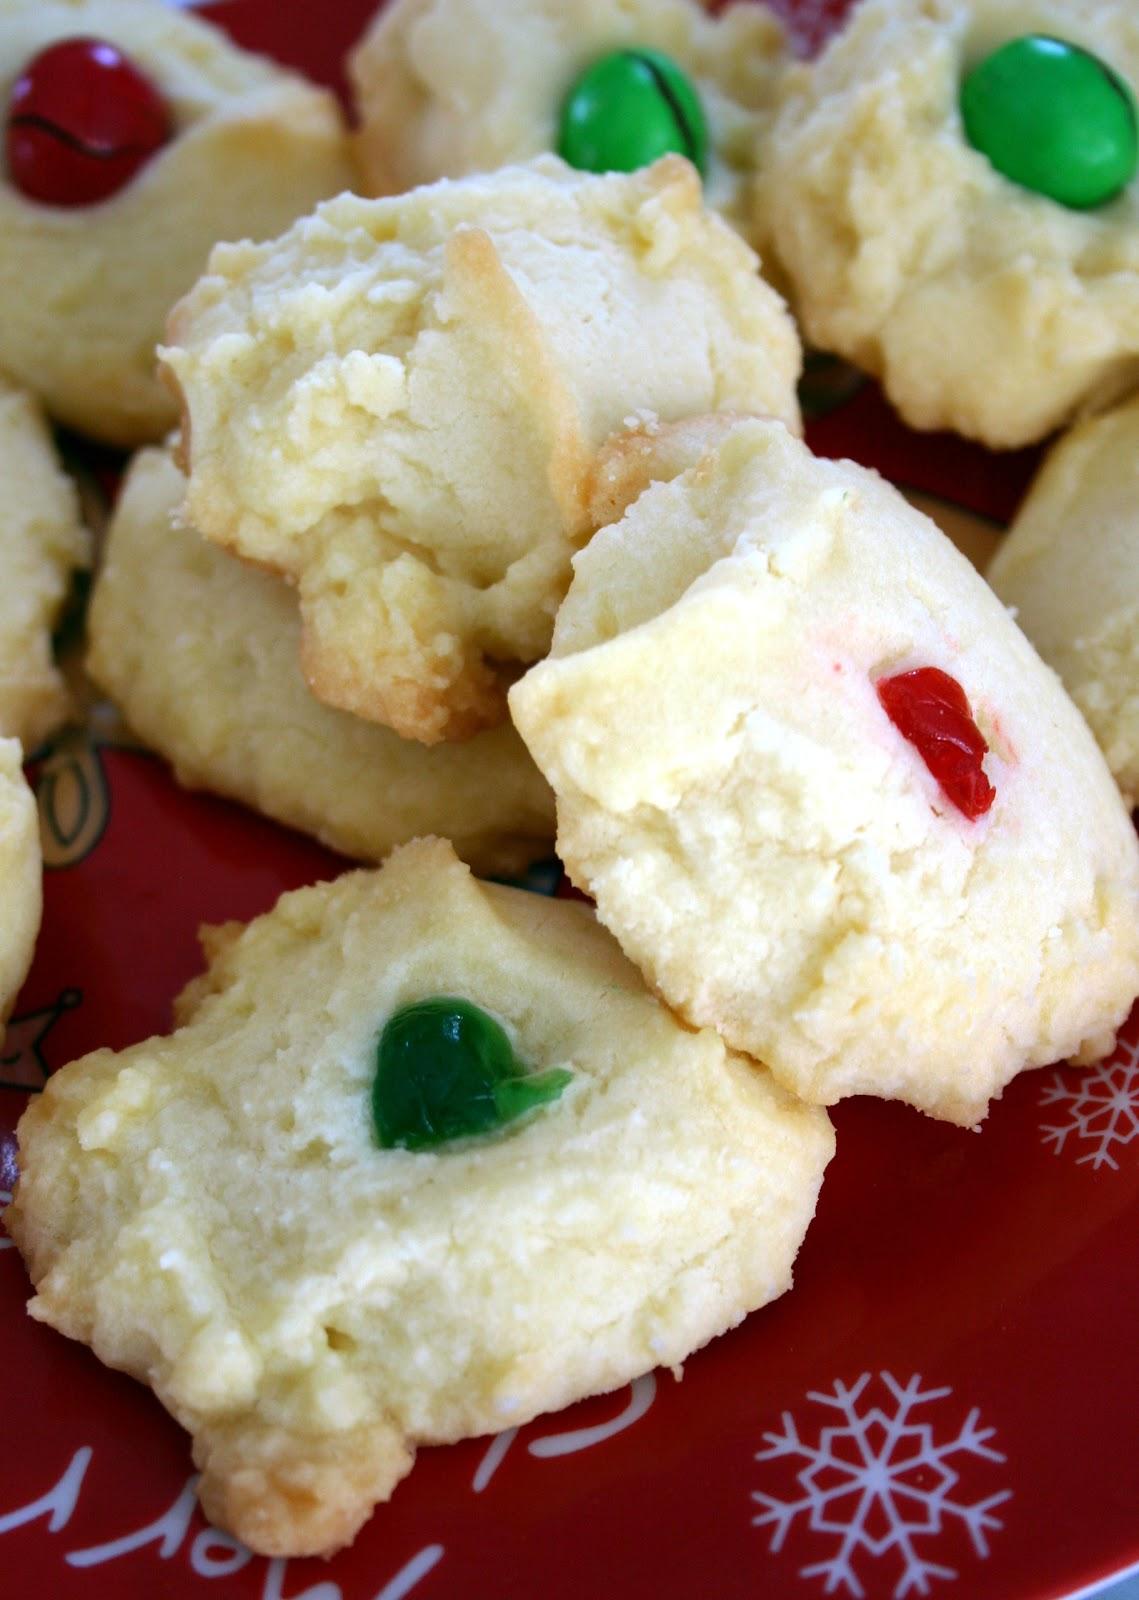 Best Shortbread Cookie Recipe: Shortbread Cookies Recipe